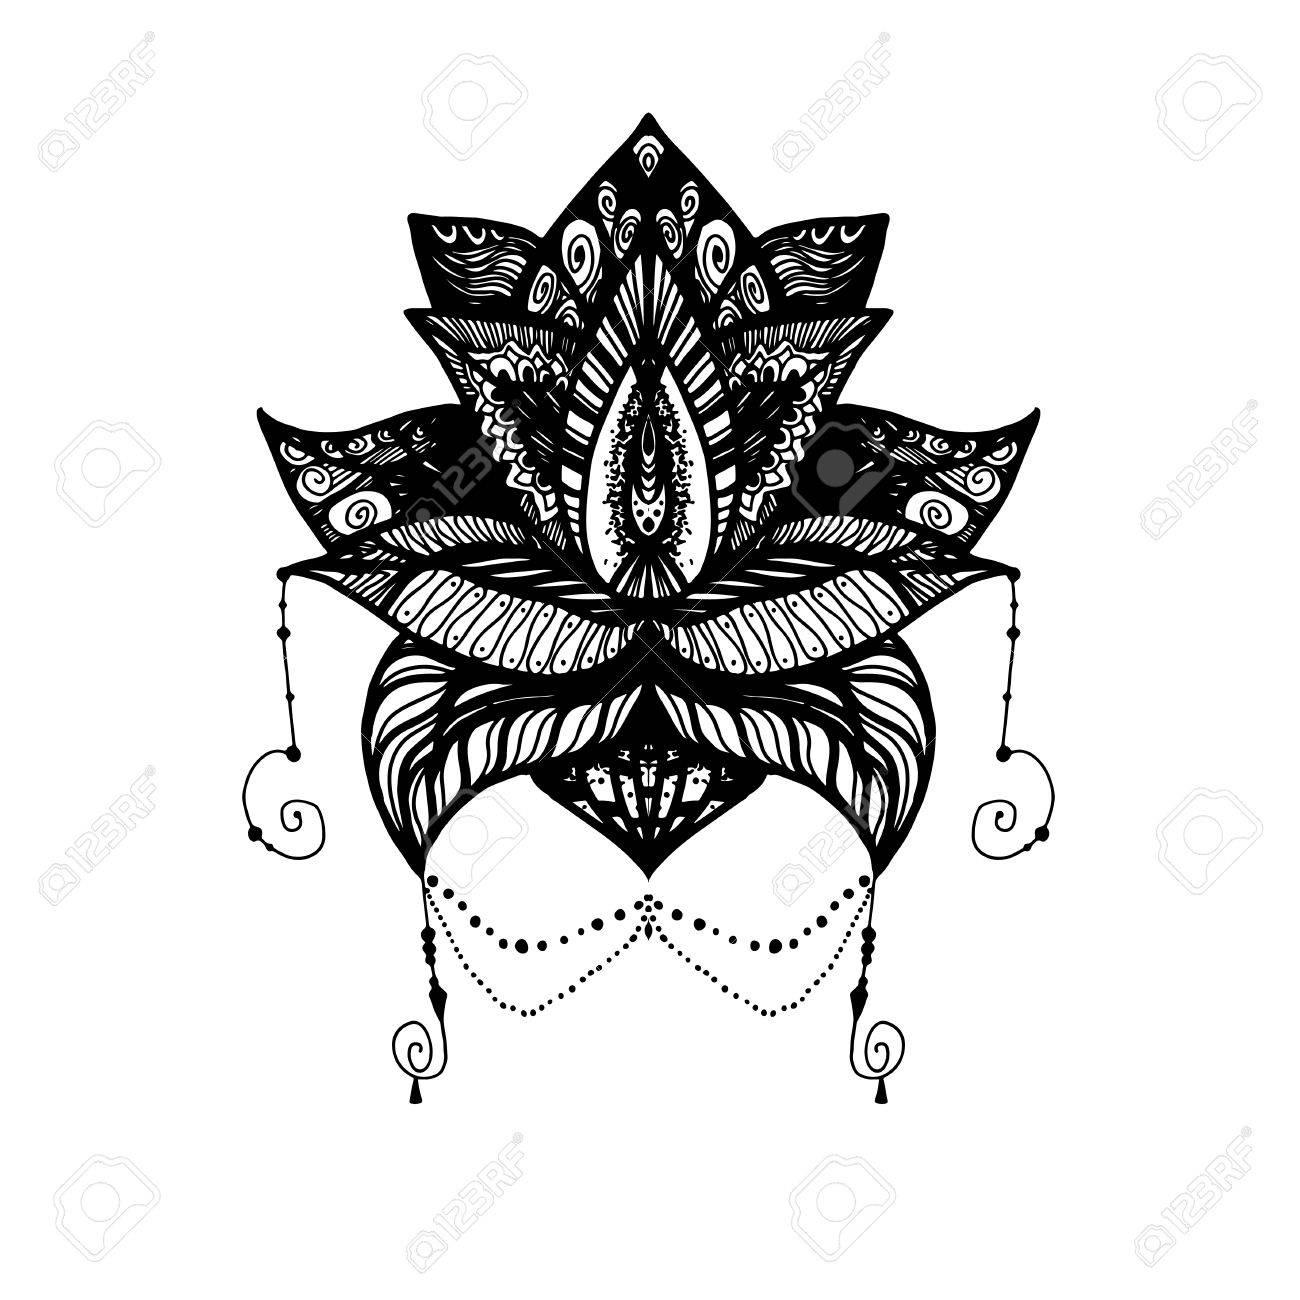 Flower lotus magic symbol for print tattoo coloring bookfabric flower lotus magic symbol for print tattoo coloring bookfabric t izmirmasajfo